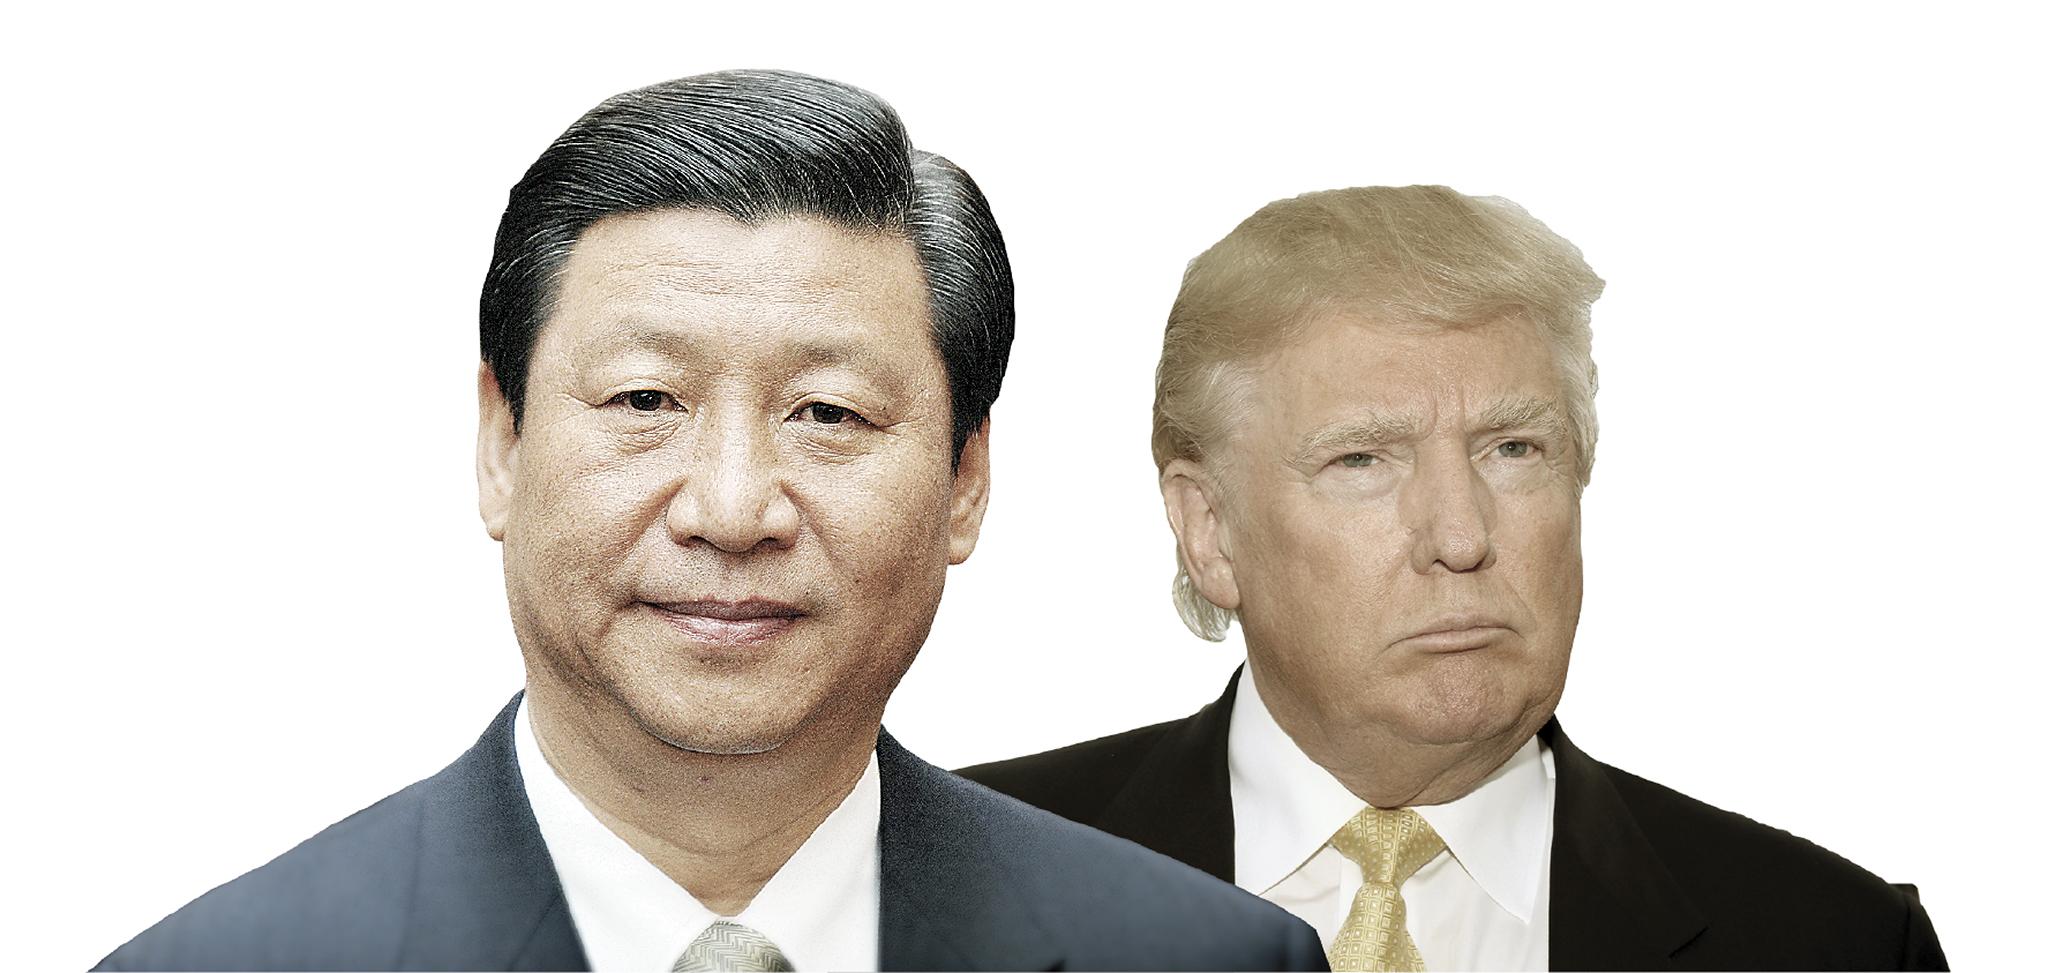 Xi Jinping e Trump reúnem-se entre 6 e 7 de Abril